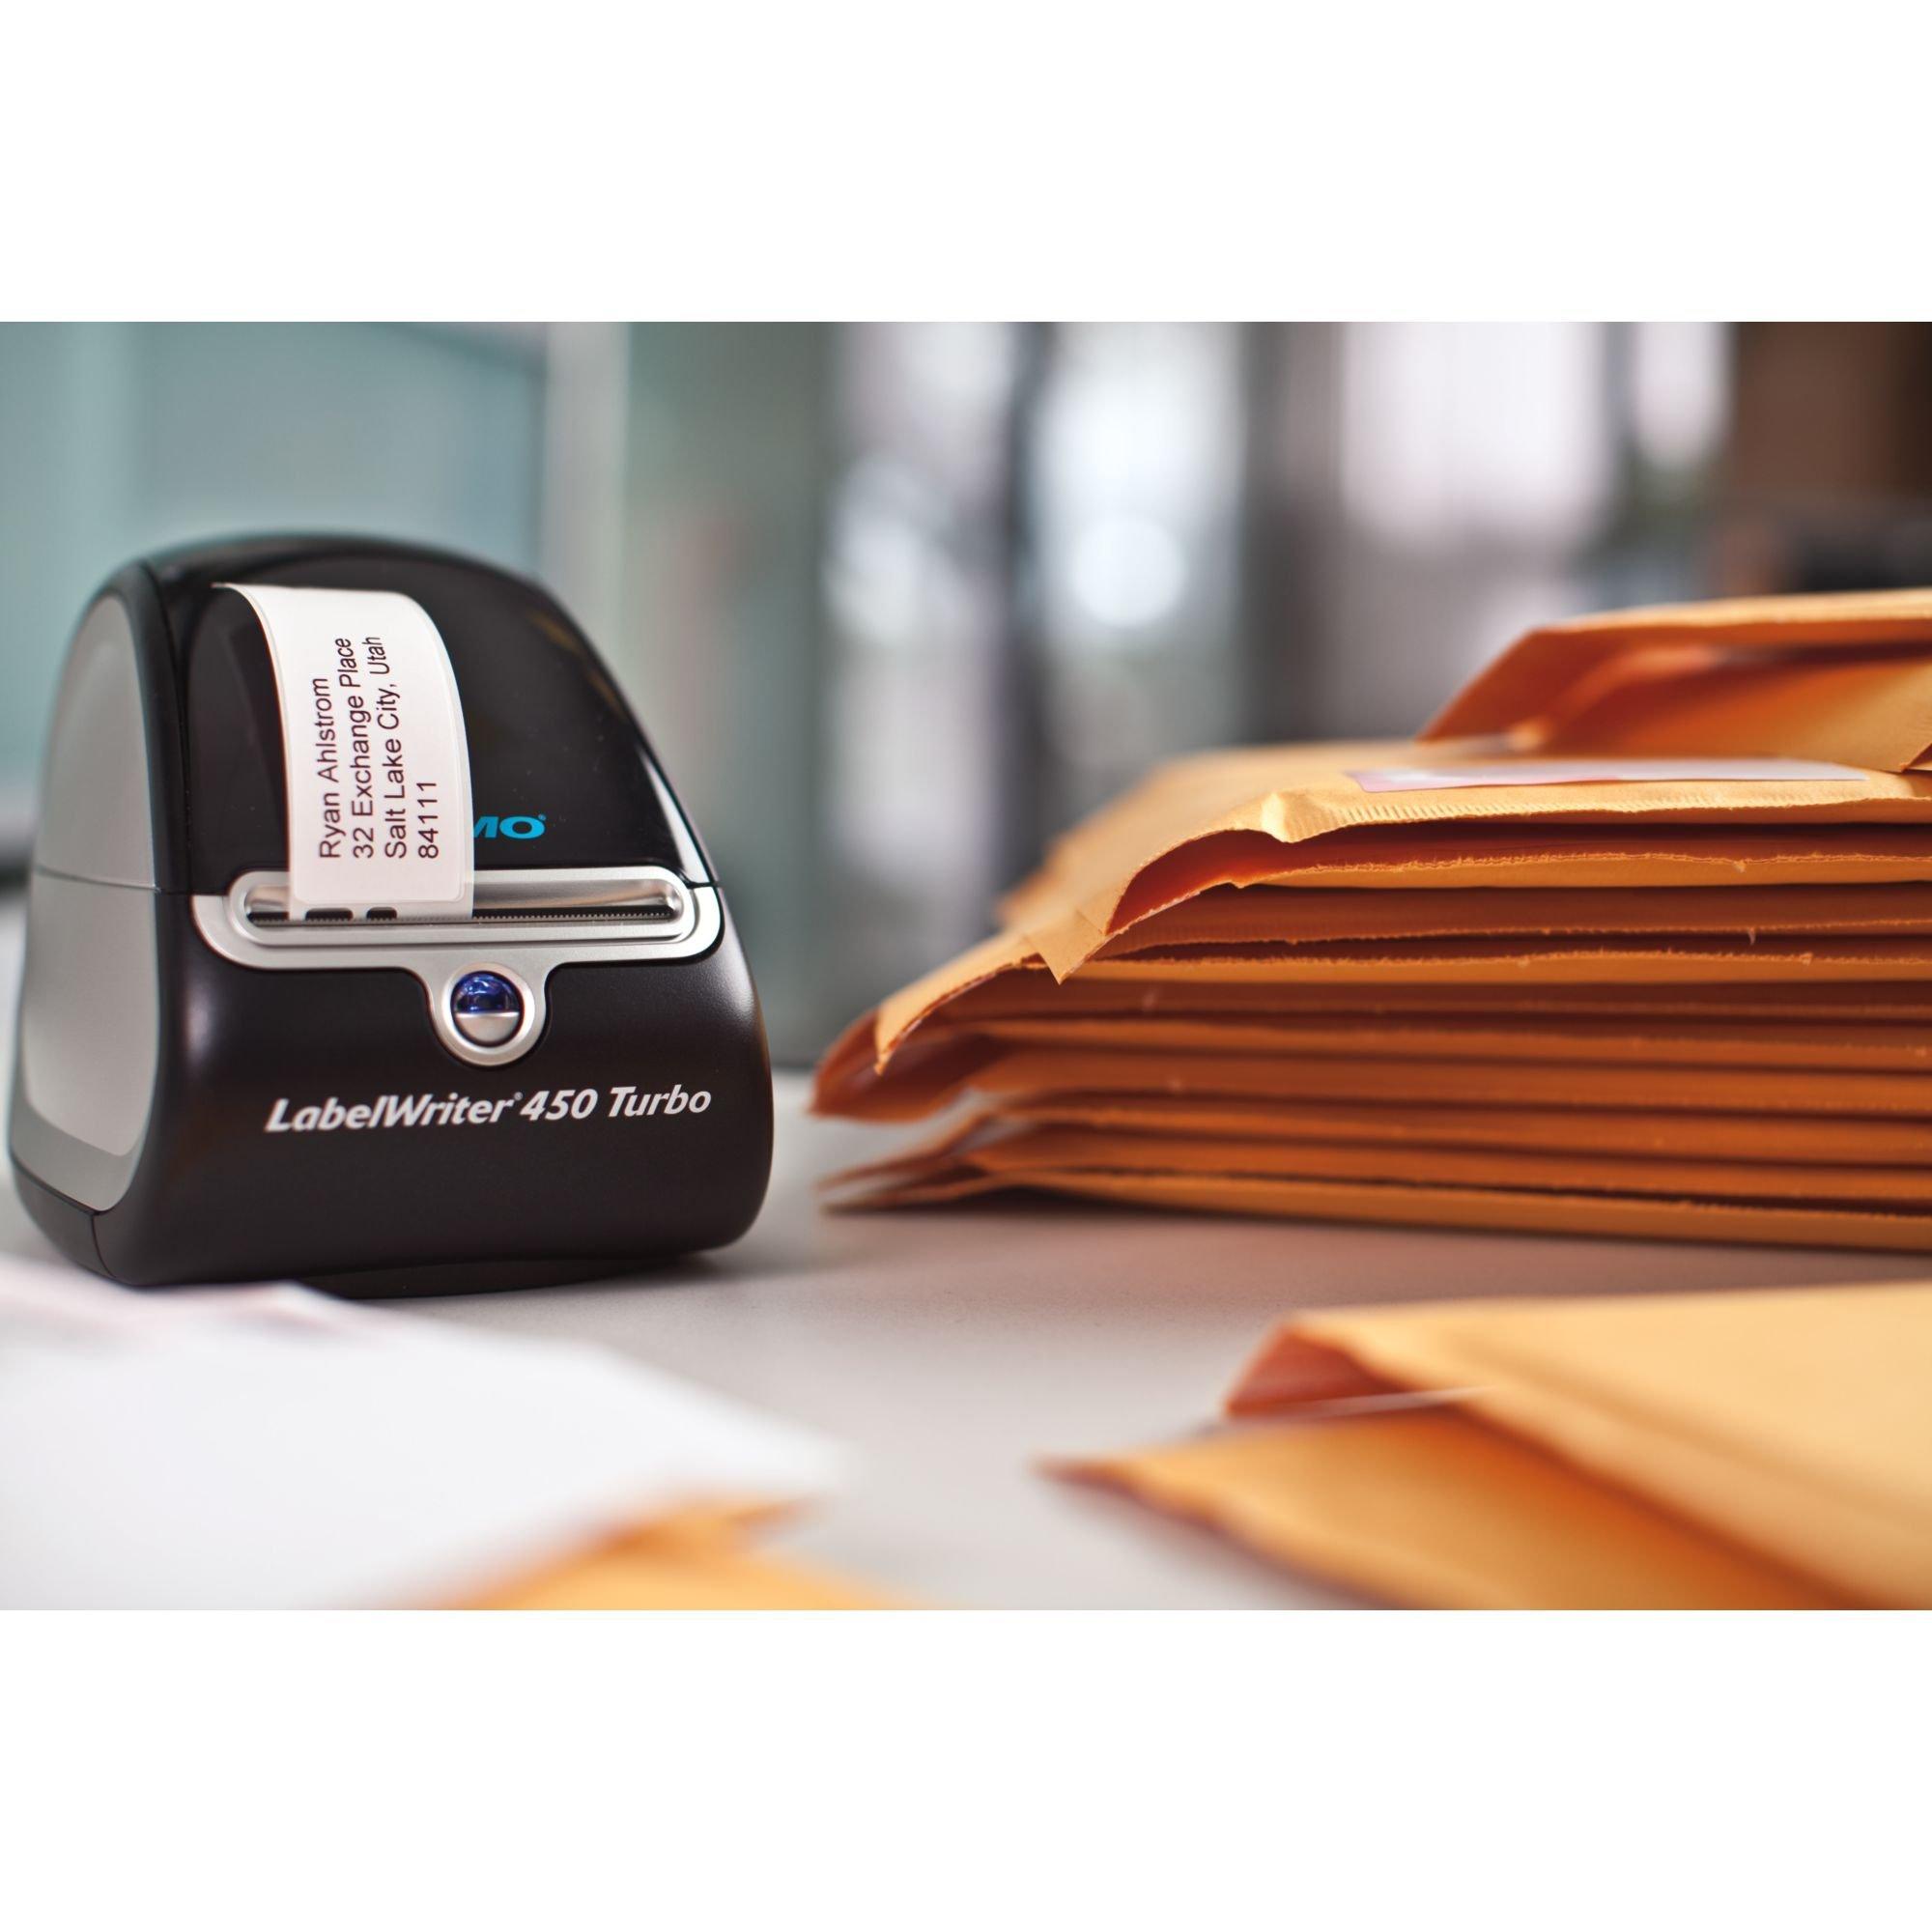 DYMO LabelWriter 450 Thermal Label Printer (1752264) + 2 bonus Multi-Purpose Rolls